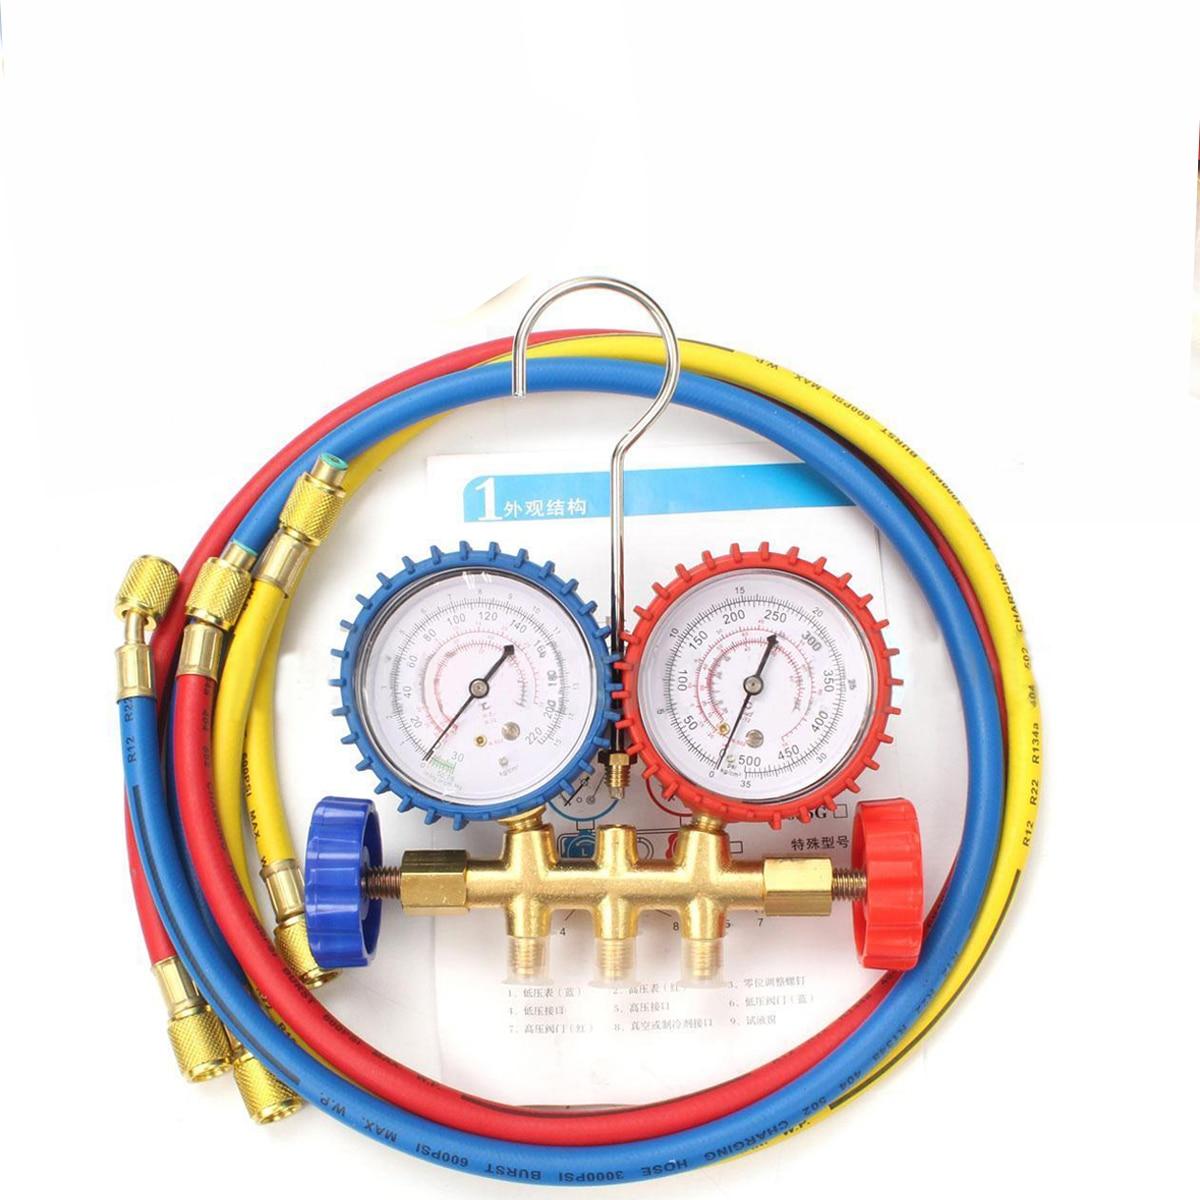 1/2PT Refrigerants Manifold Gauges Tools Set For R134A R12 R22 R404z Air Condition Refrigeration Blue Yellow Red  цены